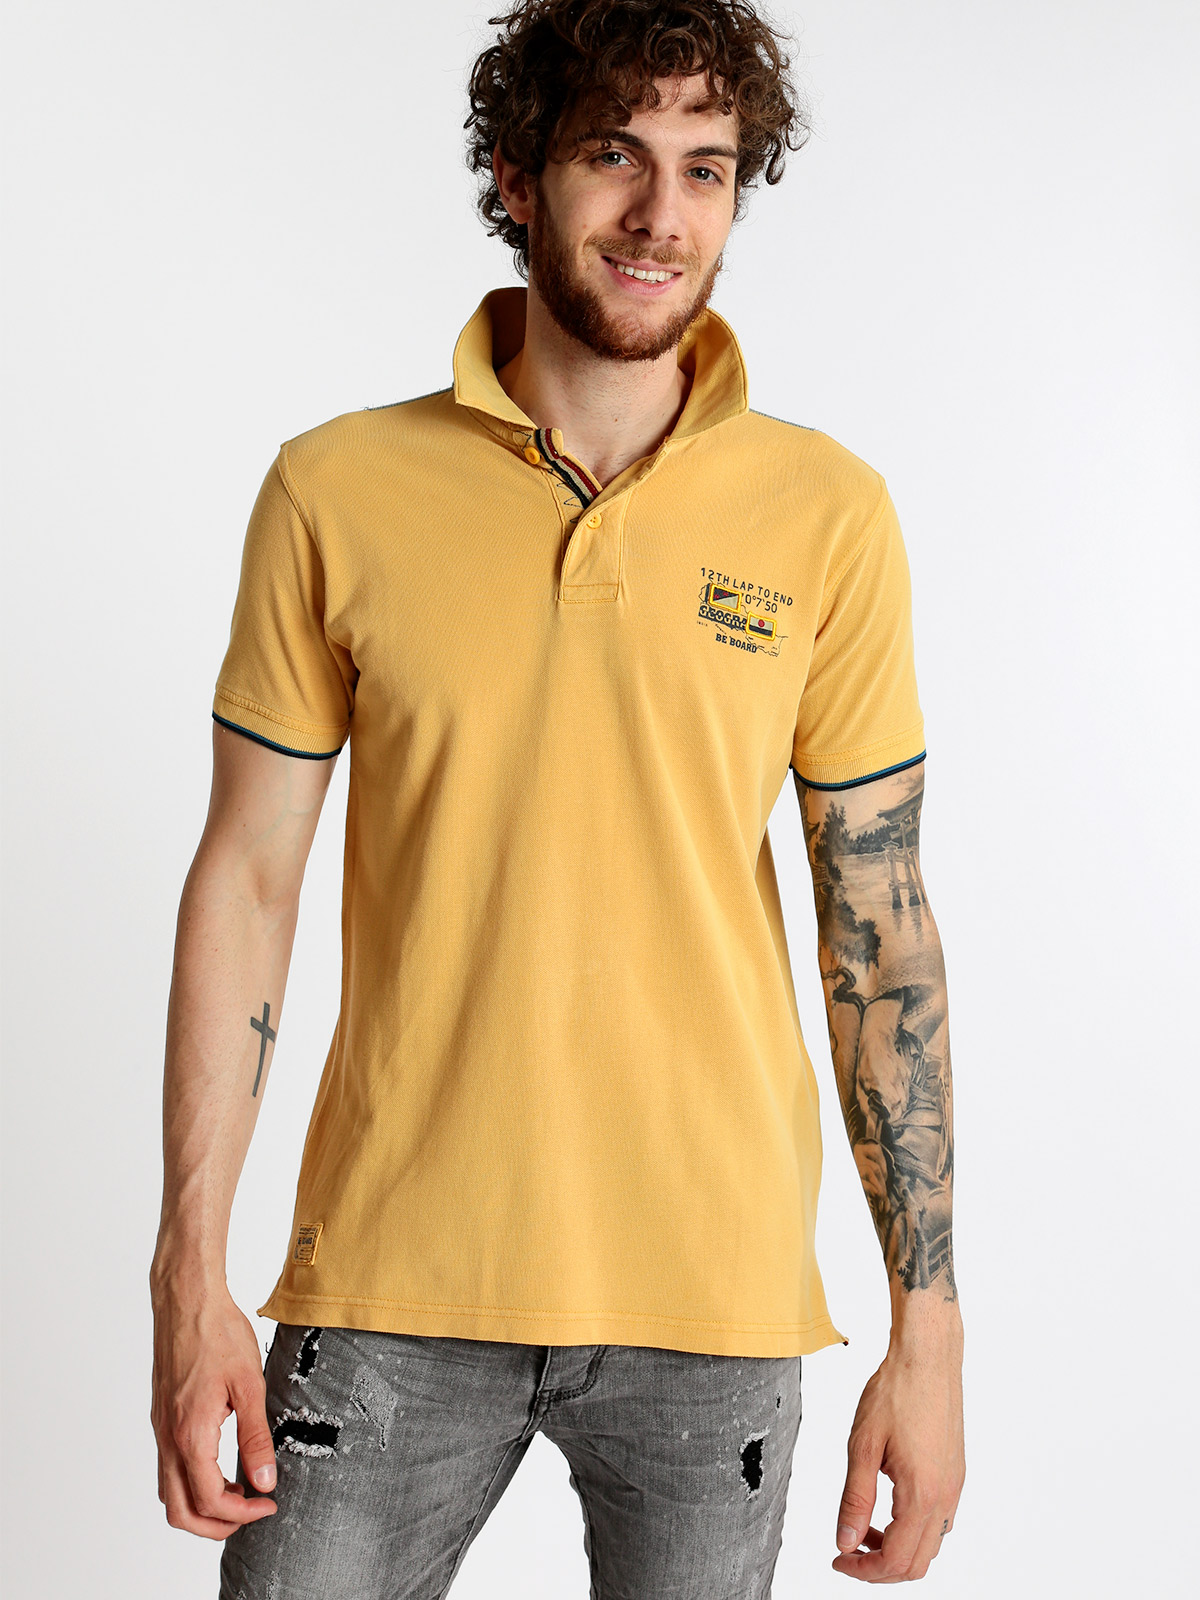 BE BOARD short-sleeved   polo   shirt men